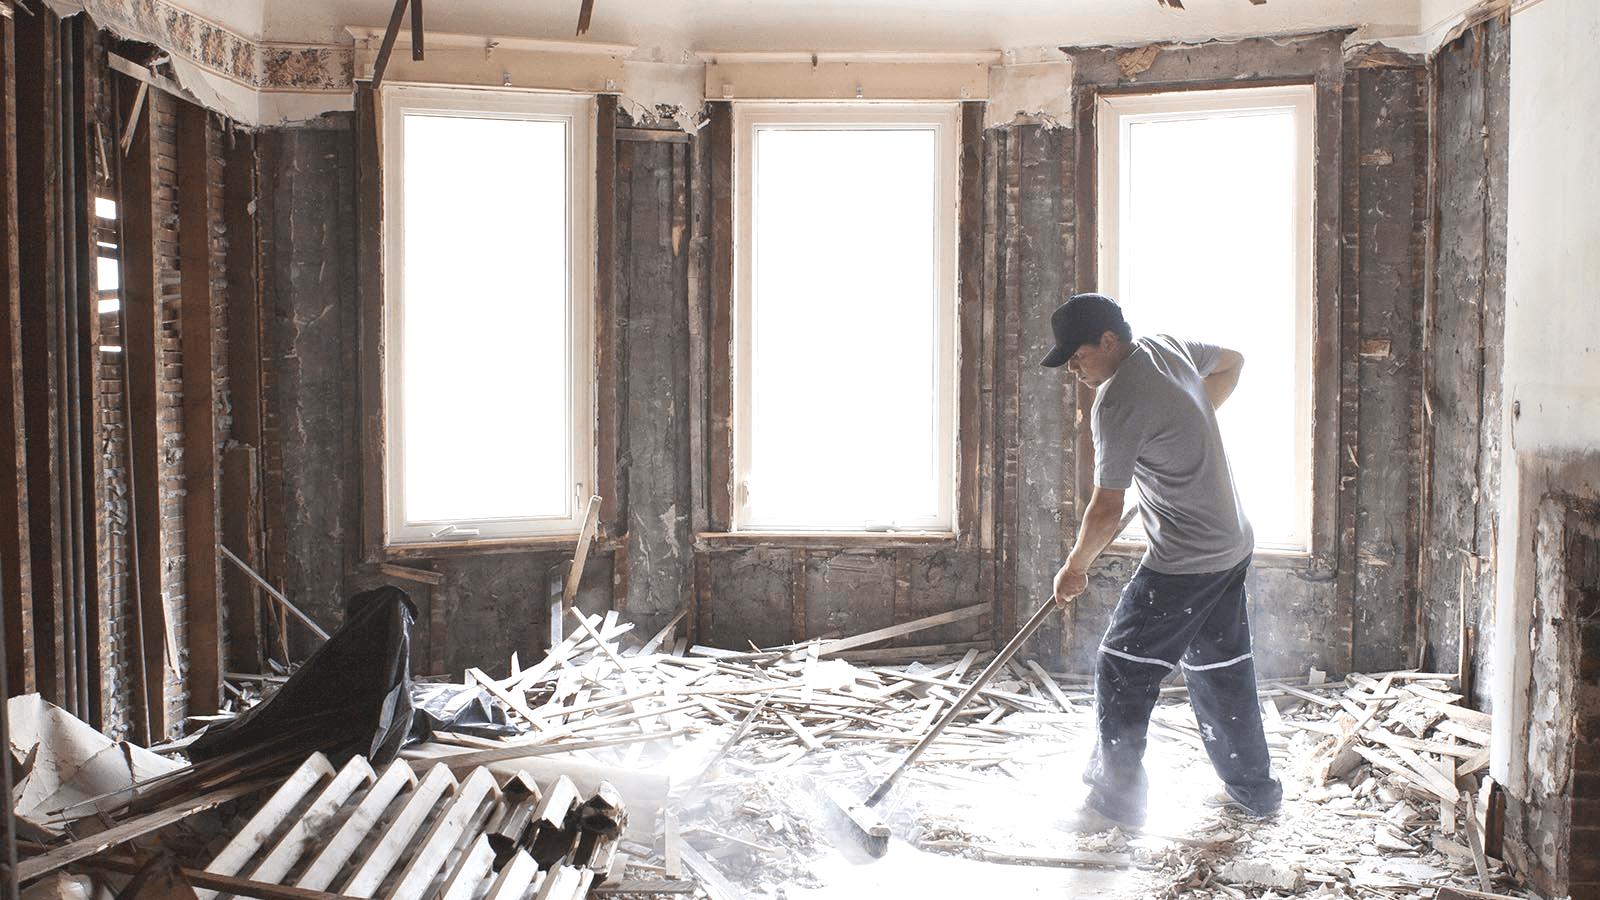 ремонт трехкомнатной квартиры, ремонт трехкомнатной квартиры под ключ, стоимость ремонта трехкомнатной квартиры, отделка трехкомнатной квартиры в новостройке, ремонт квартир в Воронеже